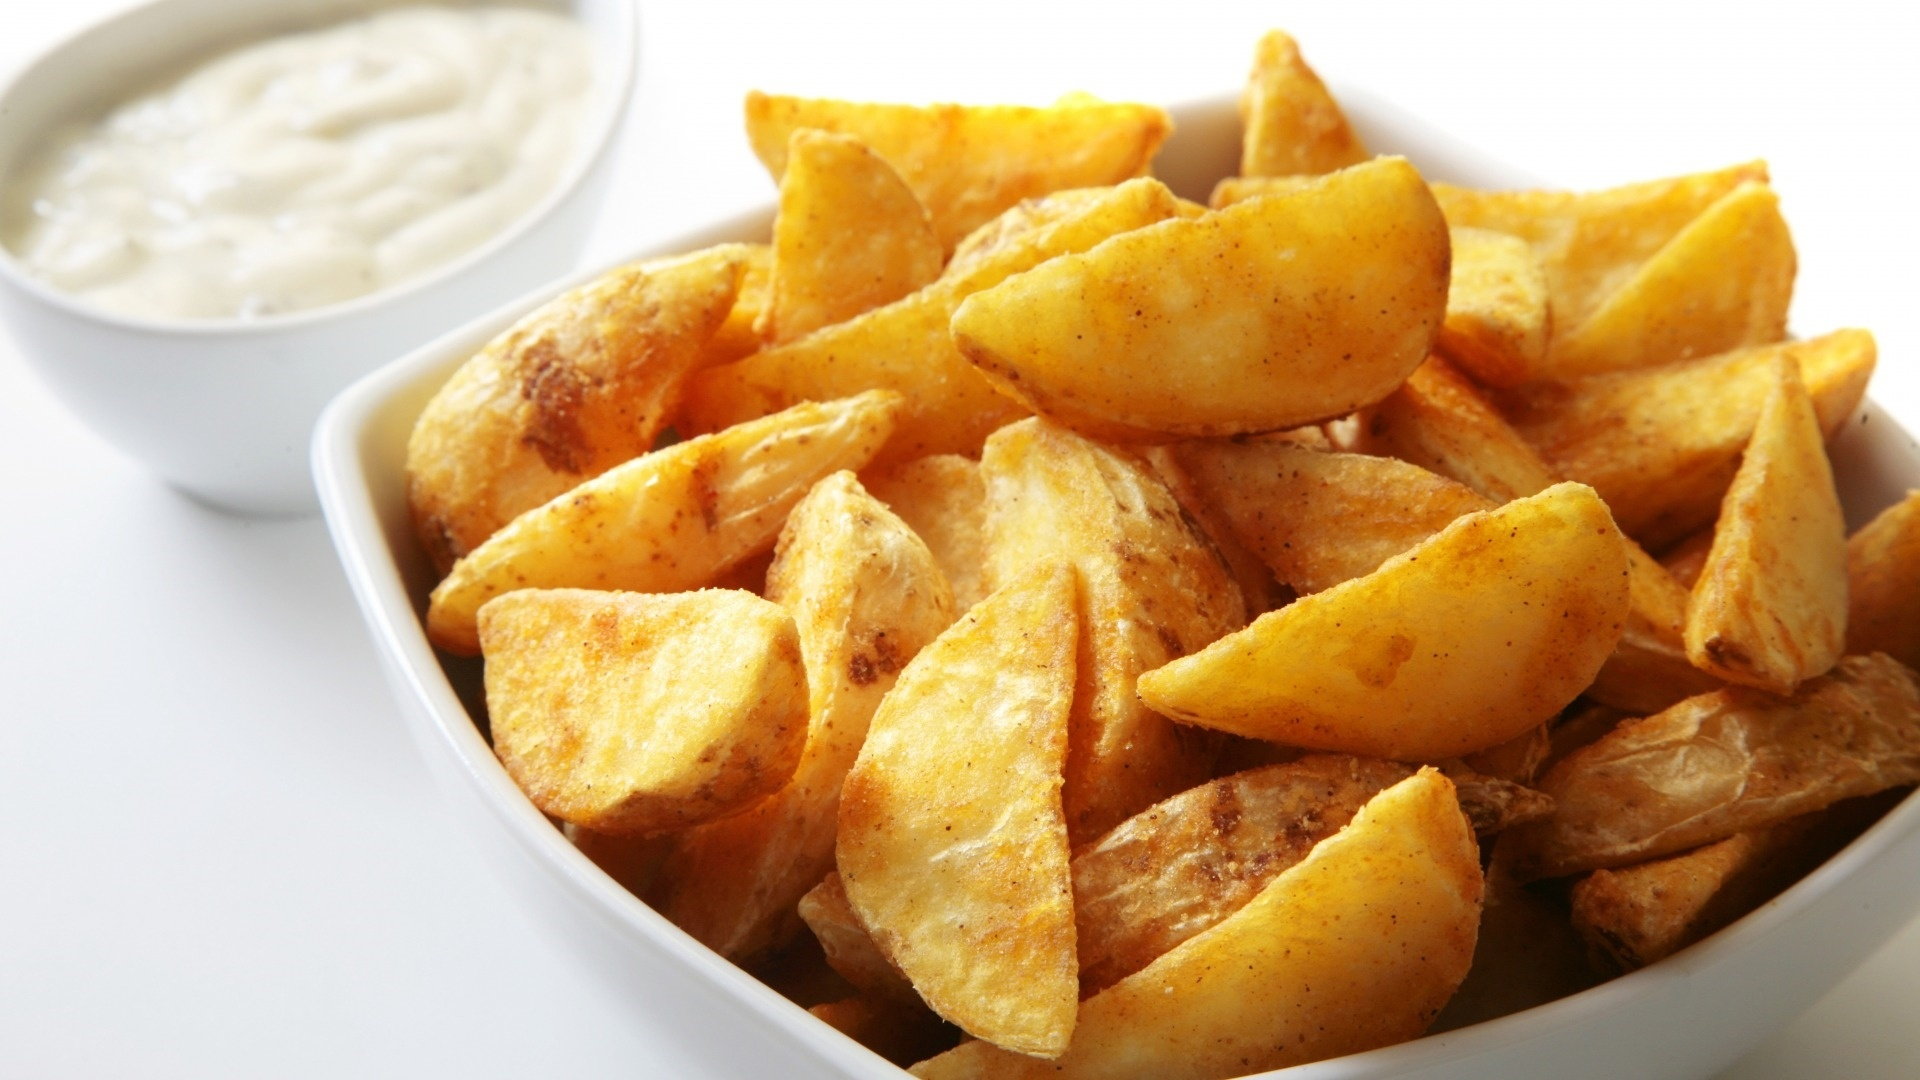 Potatoes HD Wallpaper